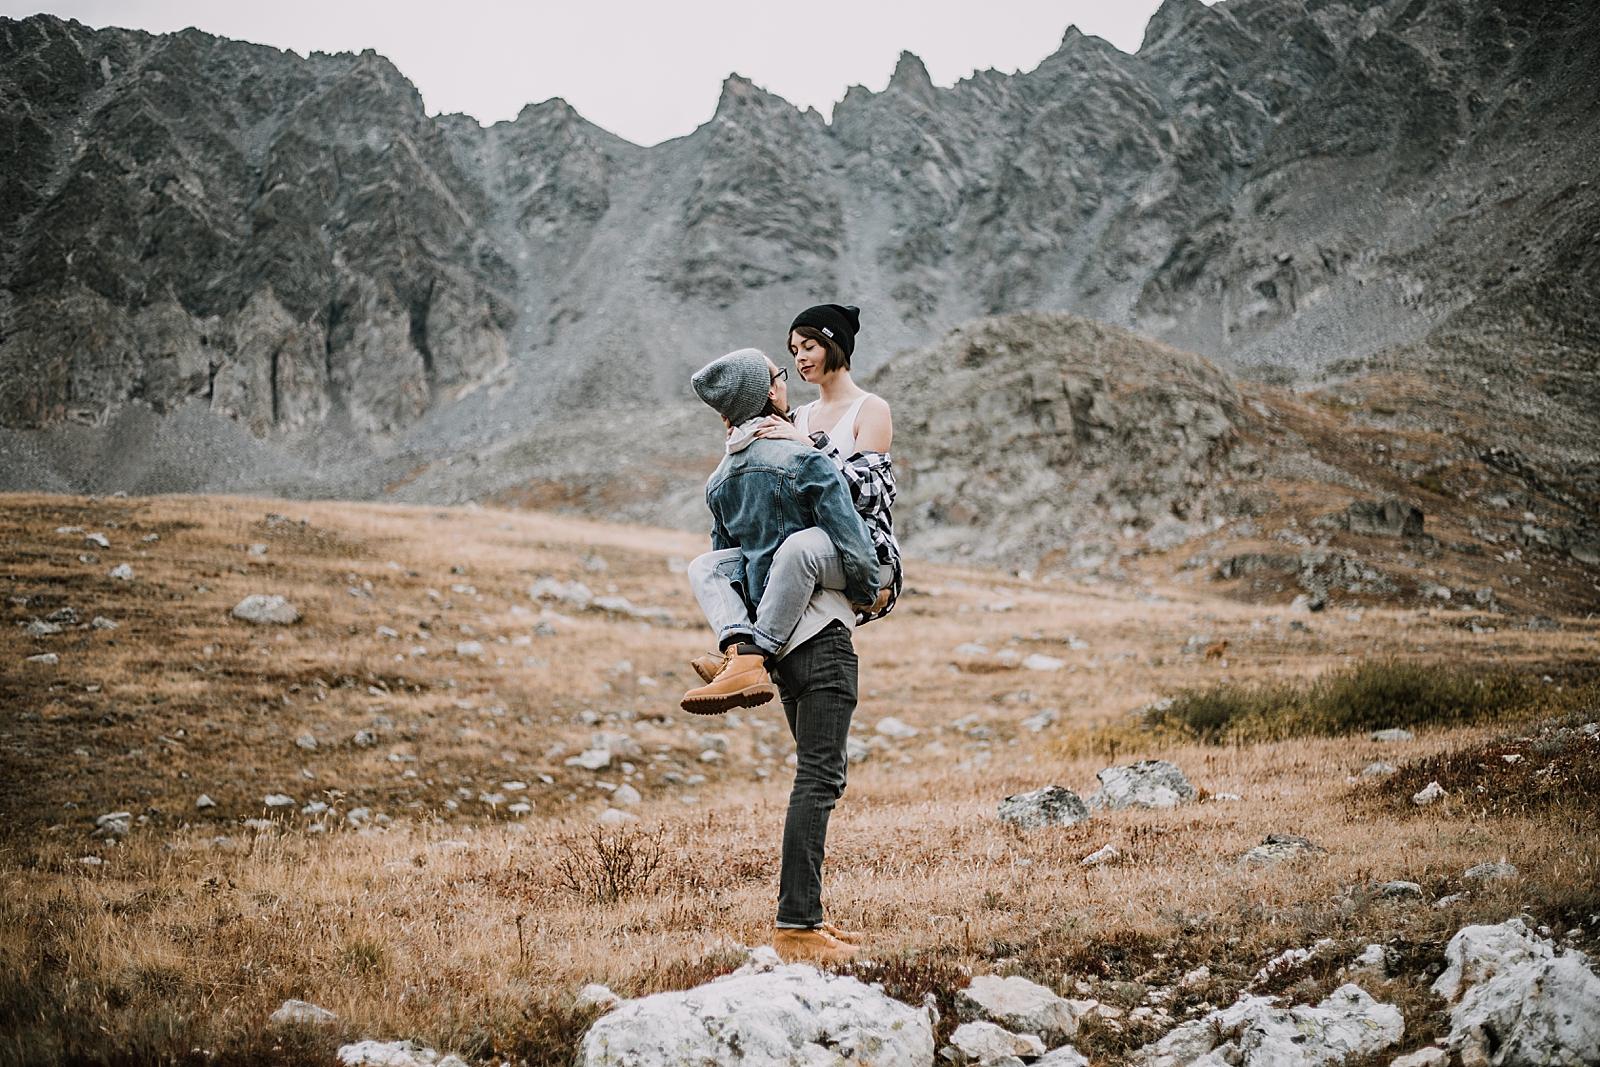 colorado hikers, hike mayflower gulch, mayflower gulch proposal, mayflower gulch elopement, mayflower gulch wedding, mayflower gulch engagments, leadville elopement, leadville hiking wedding